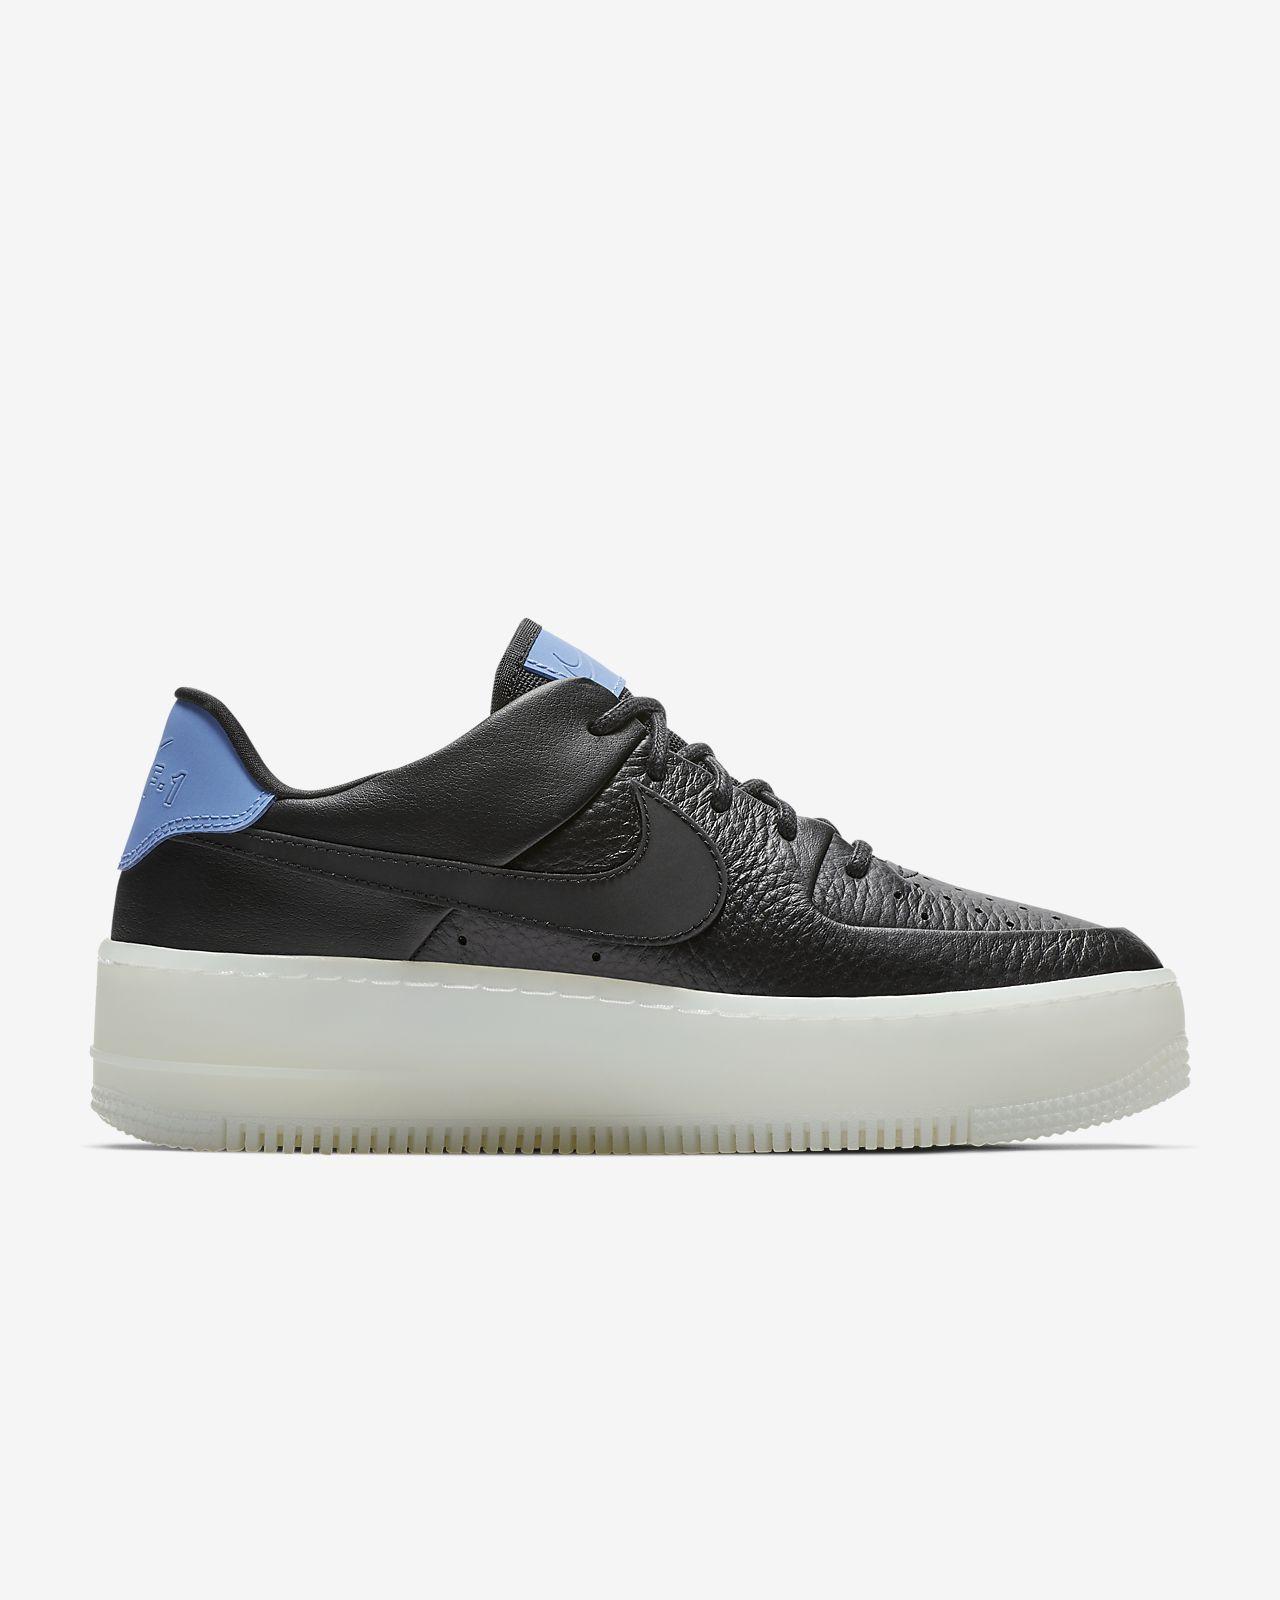 brand new 44fbb a67ff ... Sko Nike Air Force 1 Sage Low LX för kvinnor